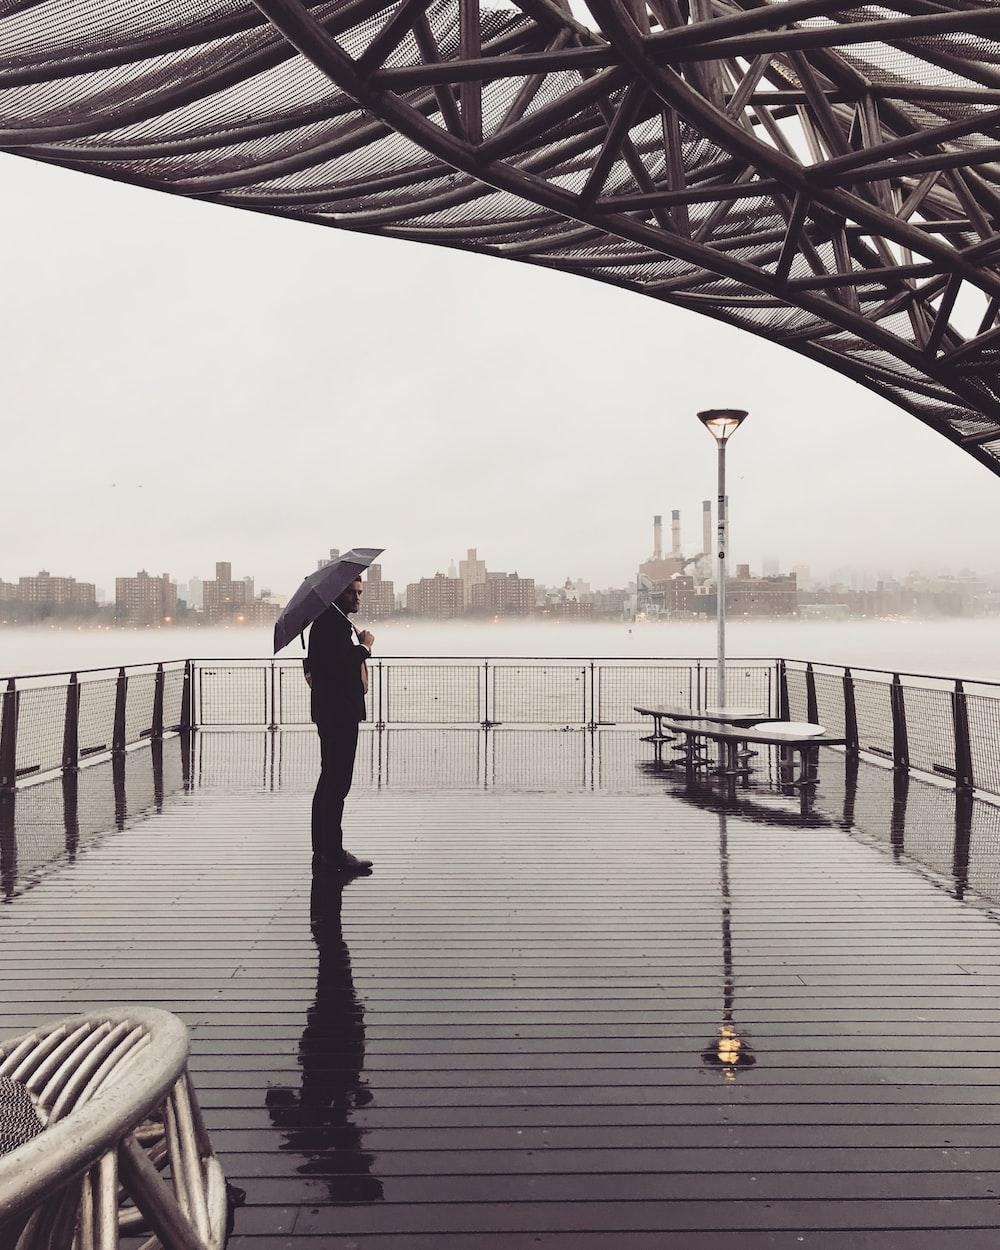 man standing on the ocean dock holding umbrella